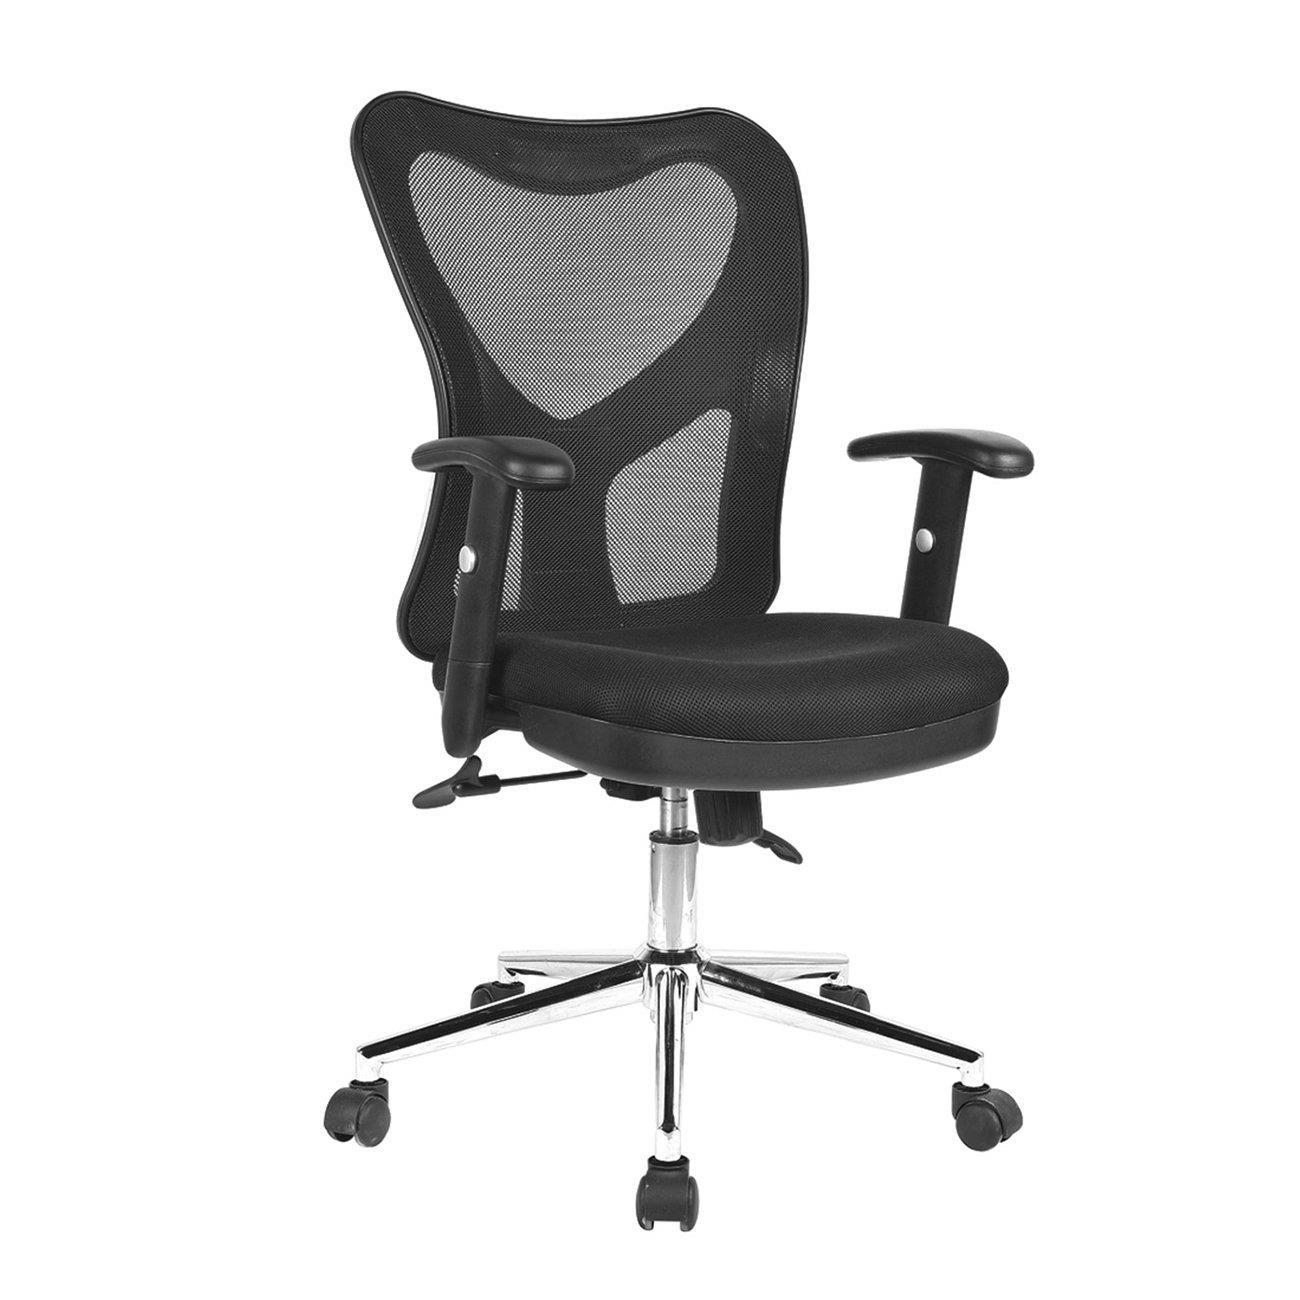 office chair base swivel ashley furniture techni mobili high back mesh with chrome